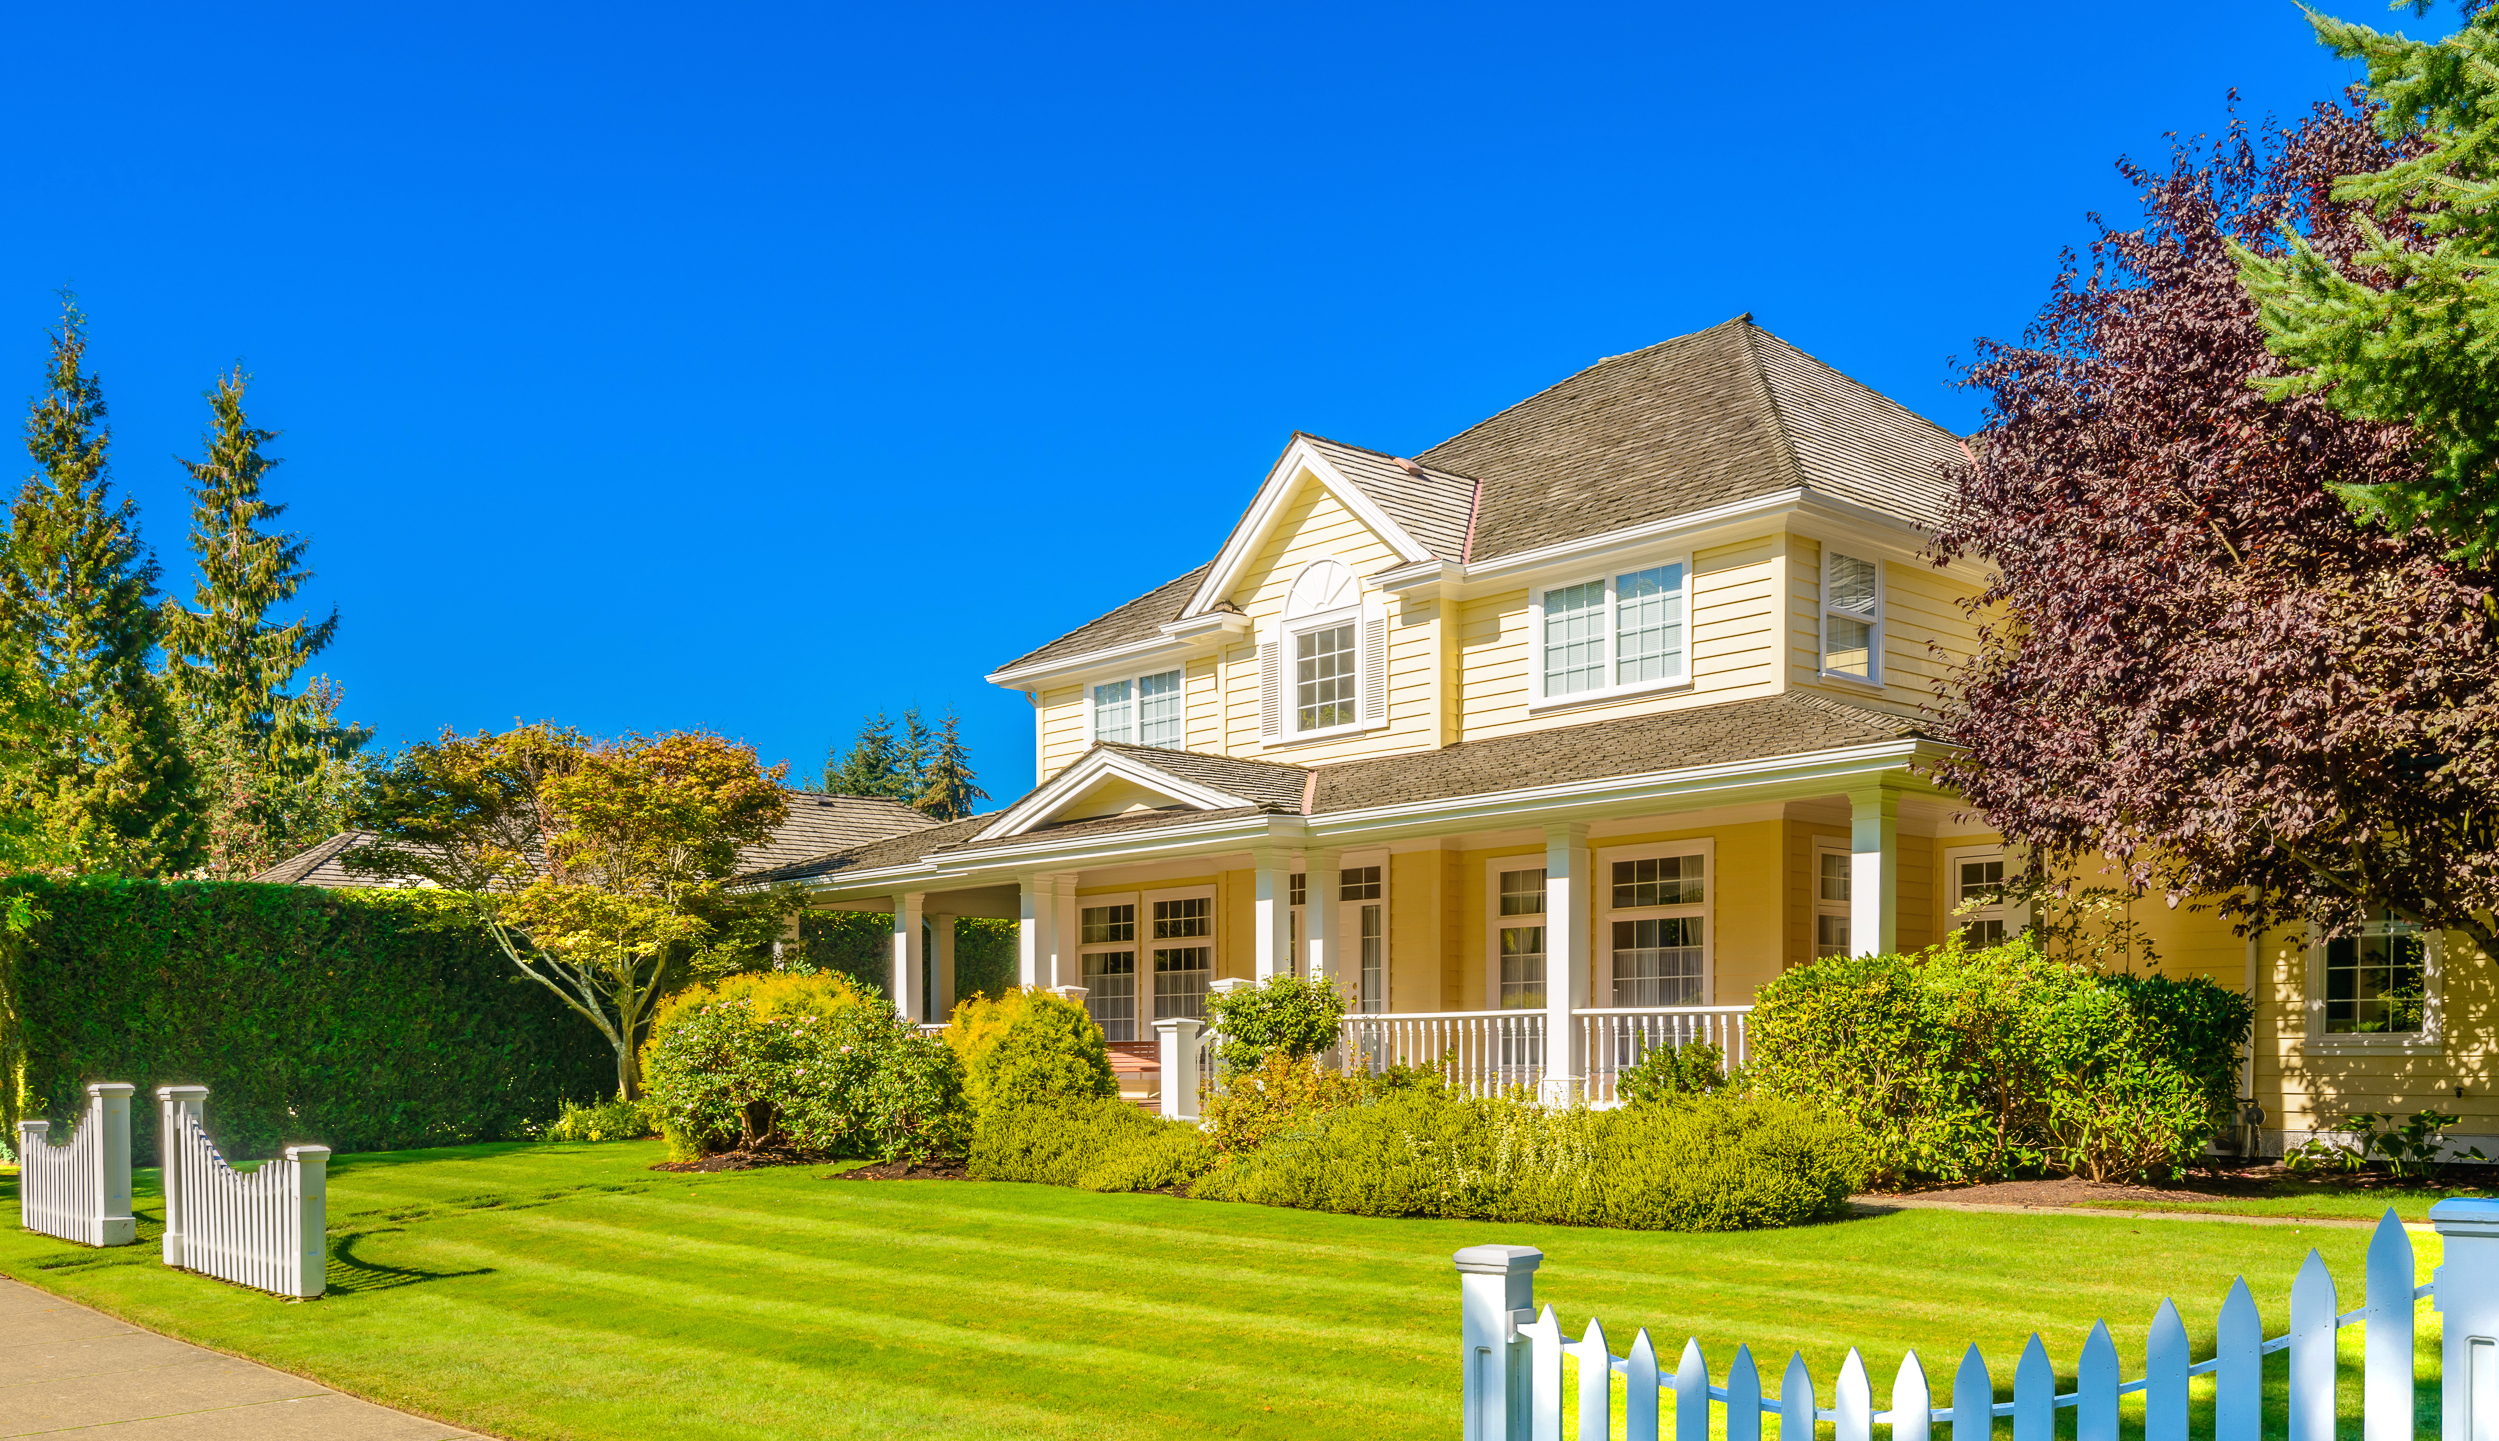 greenville real estate greenville sc homes for sale south carolina